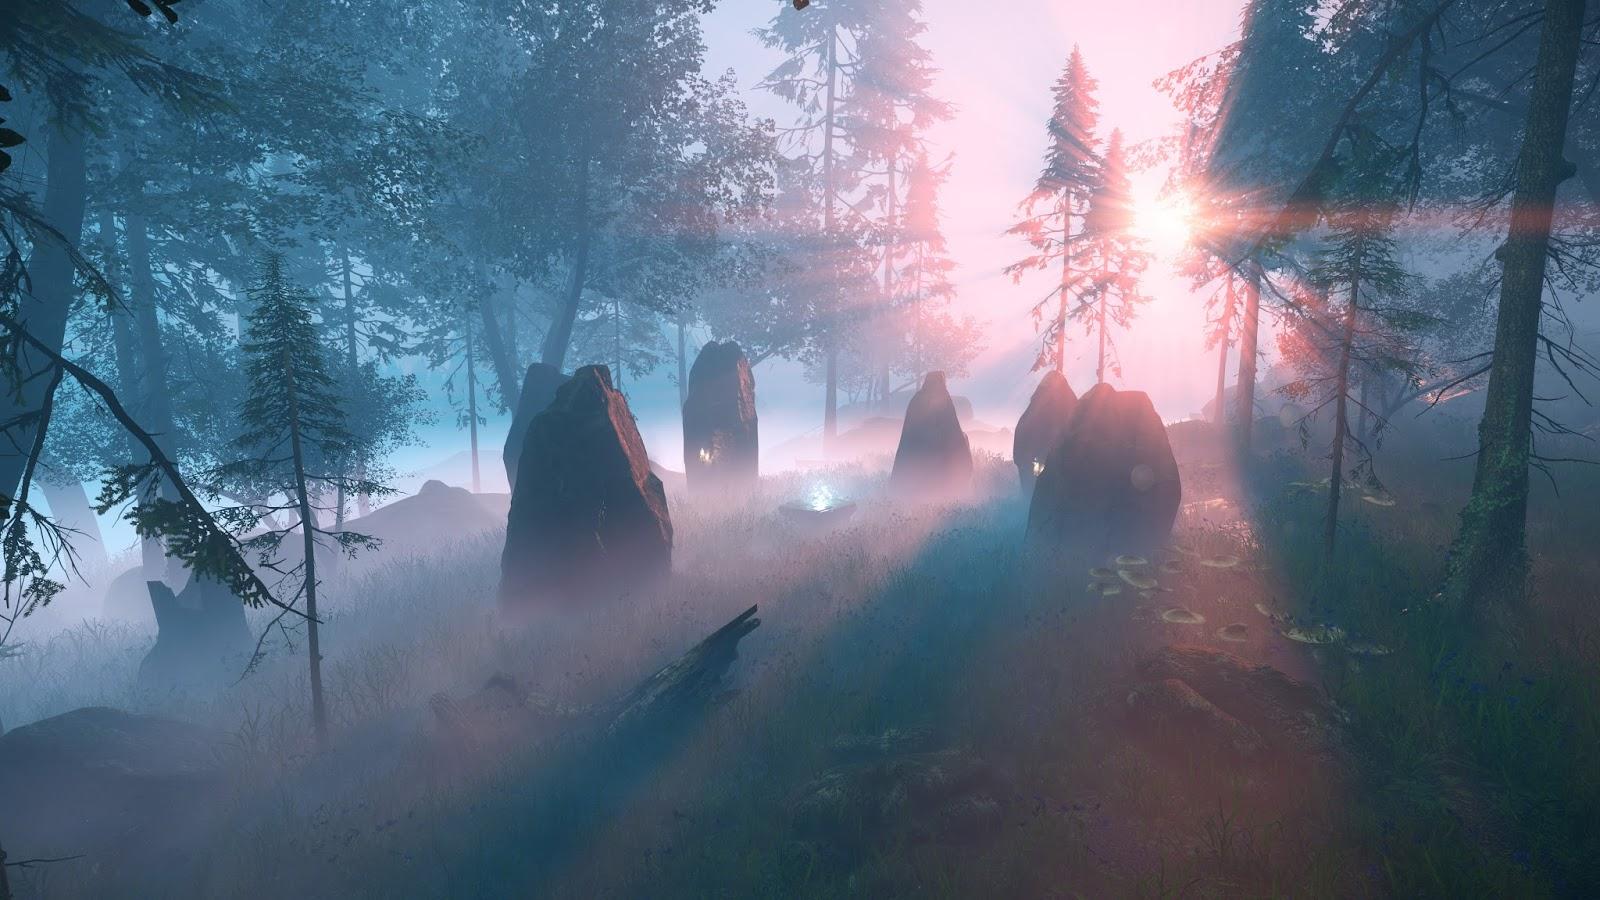 Aporia Beyond The Valley, Aporia, приключение, головоломка, паззл, Adventure, Puzzle, фантастика, фэнтези, SciFi, Fantasy, обзор, рецензия, Review